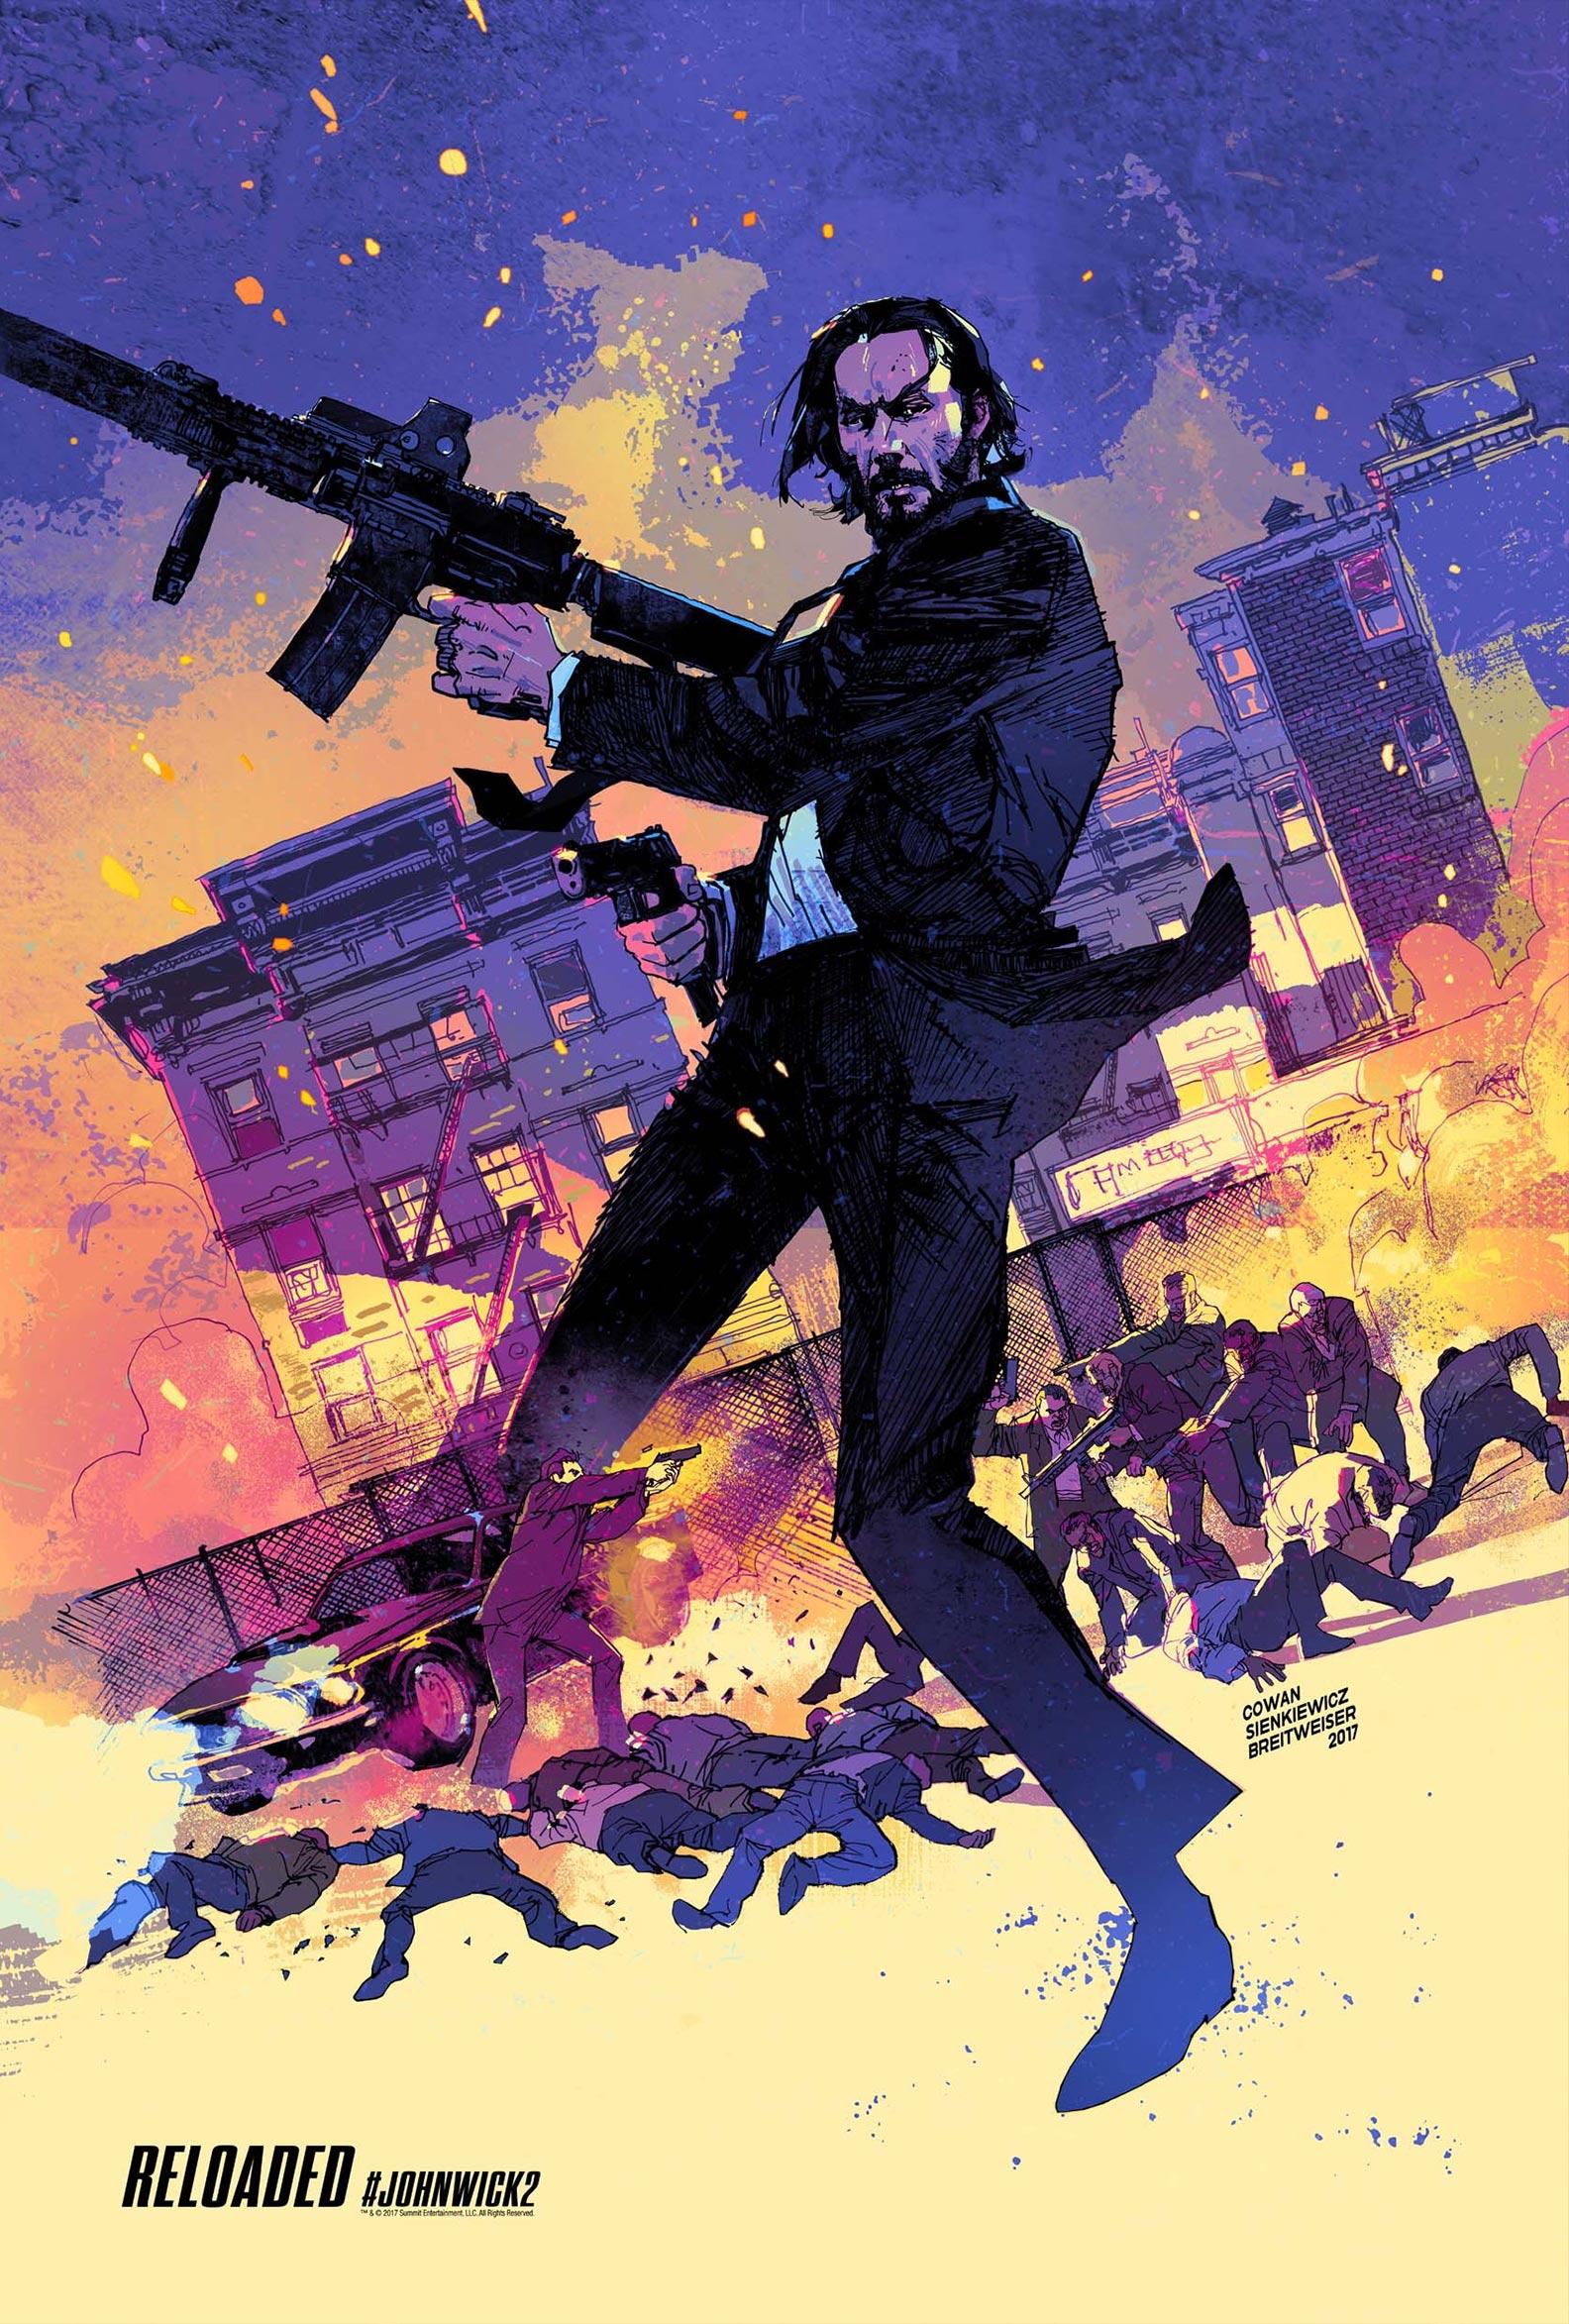 John Wick: Chapter 2 Poster #17